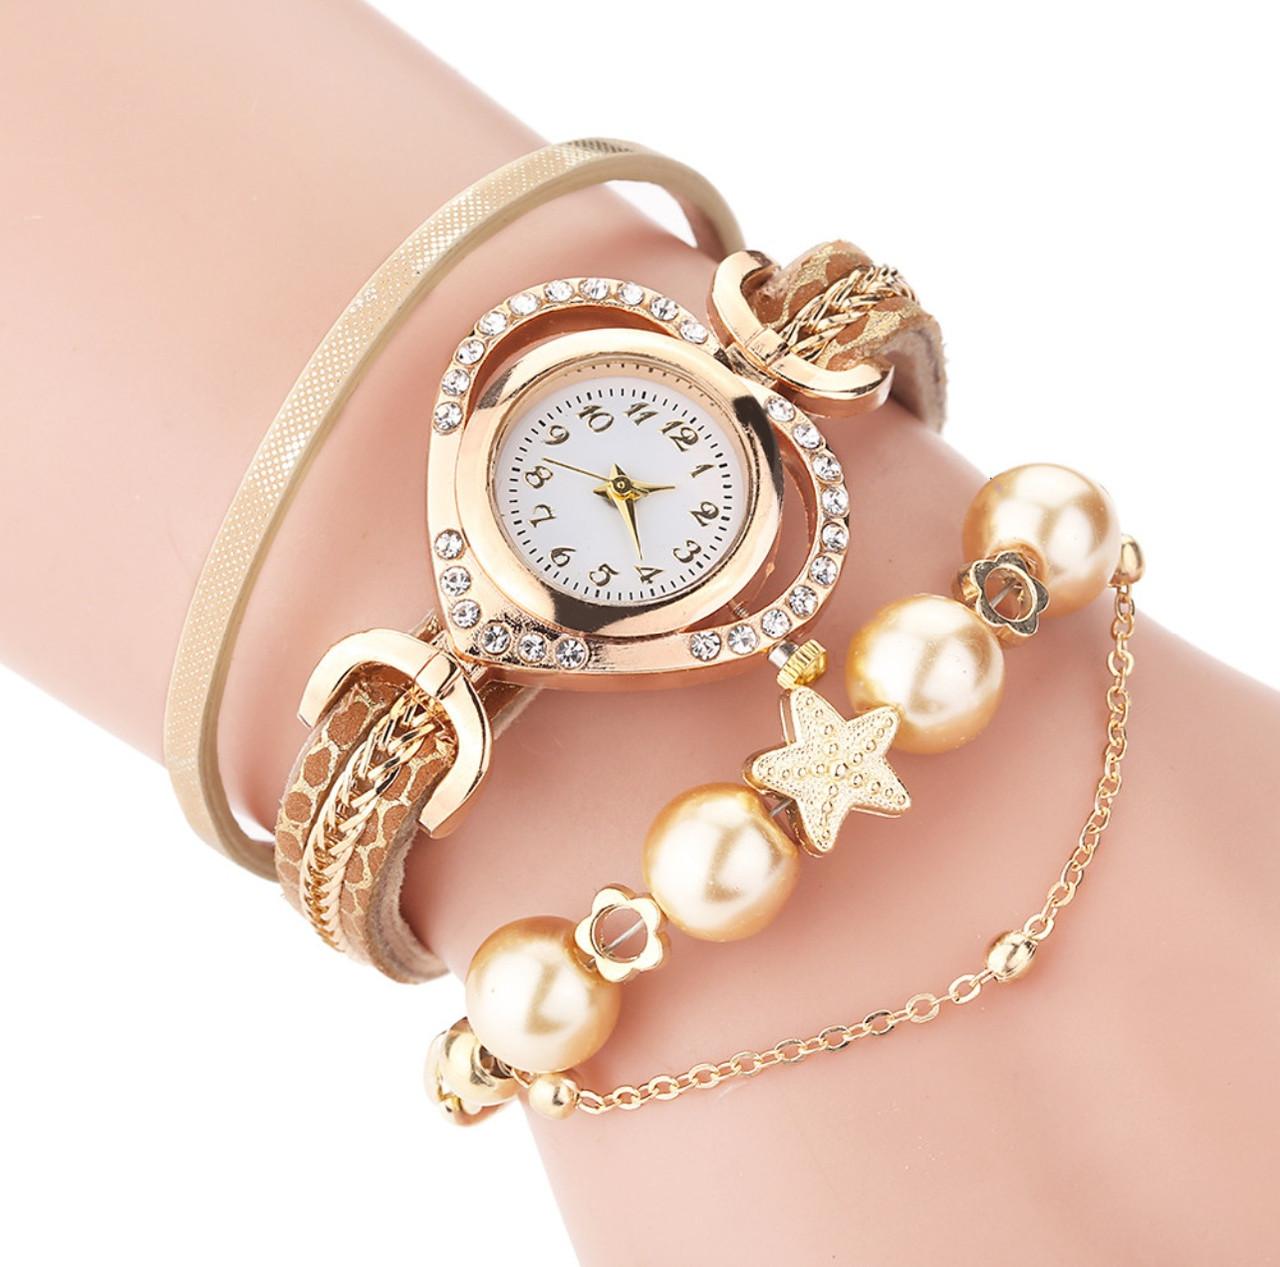 Часы браслет Carude три цвета